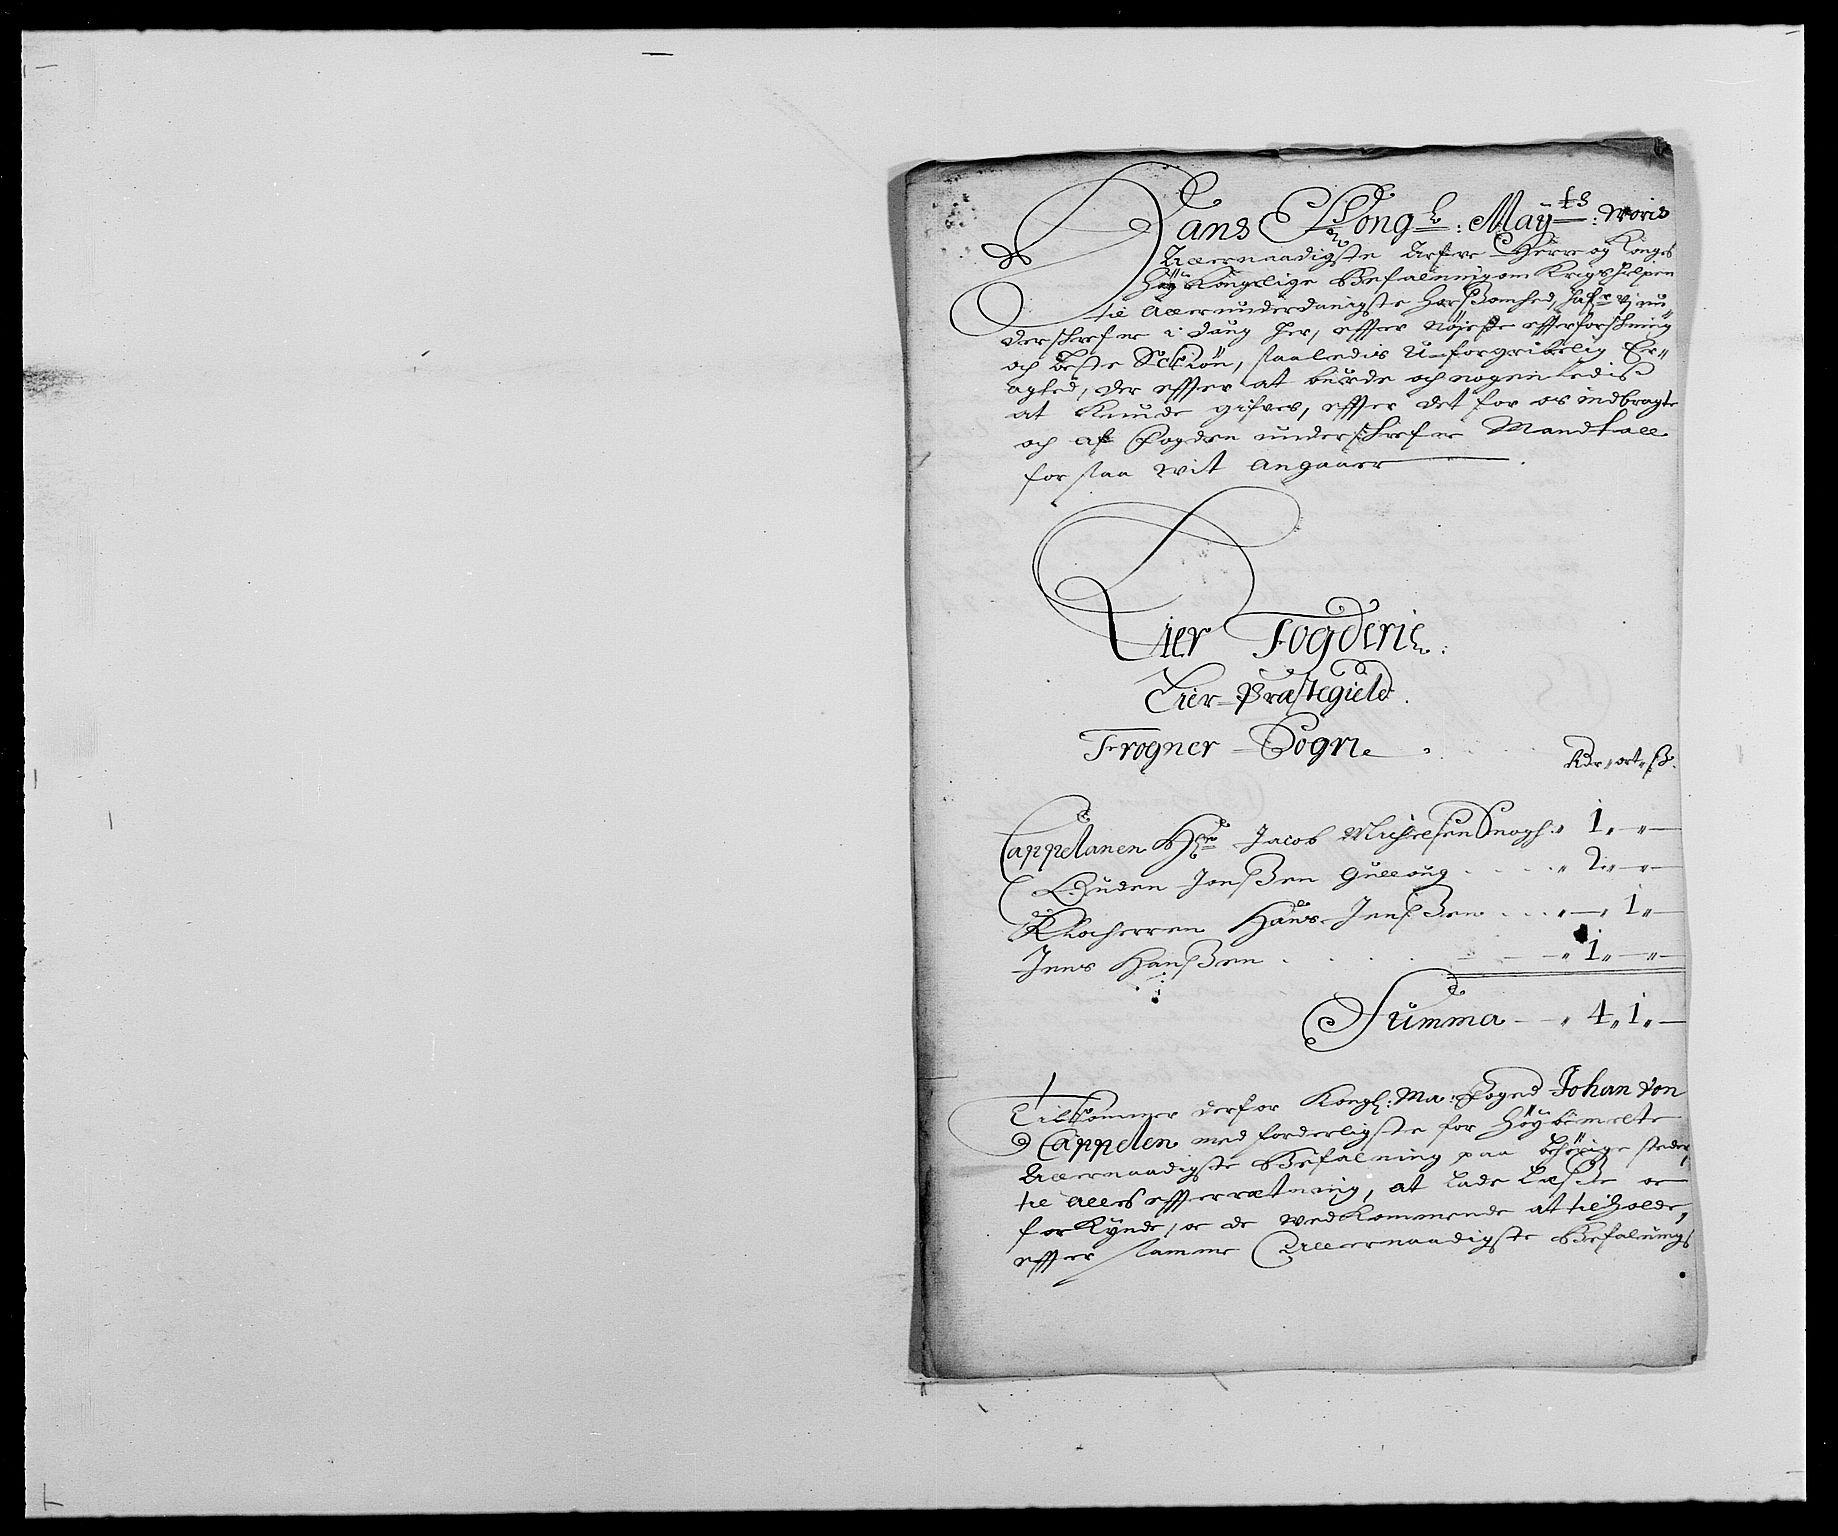 RA, Rentekammeret inntil 1814, Reviderte regnskaper, Fogderegnskap, R27/L1687: Fogderegnskap Lier, 1678-1686, s. 68